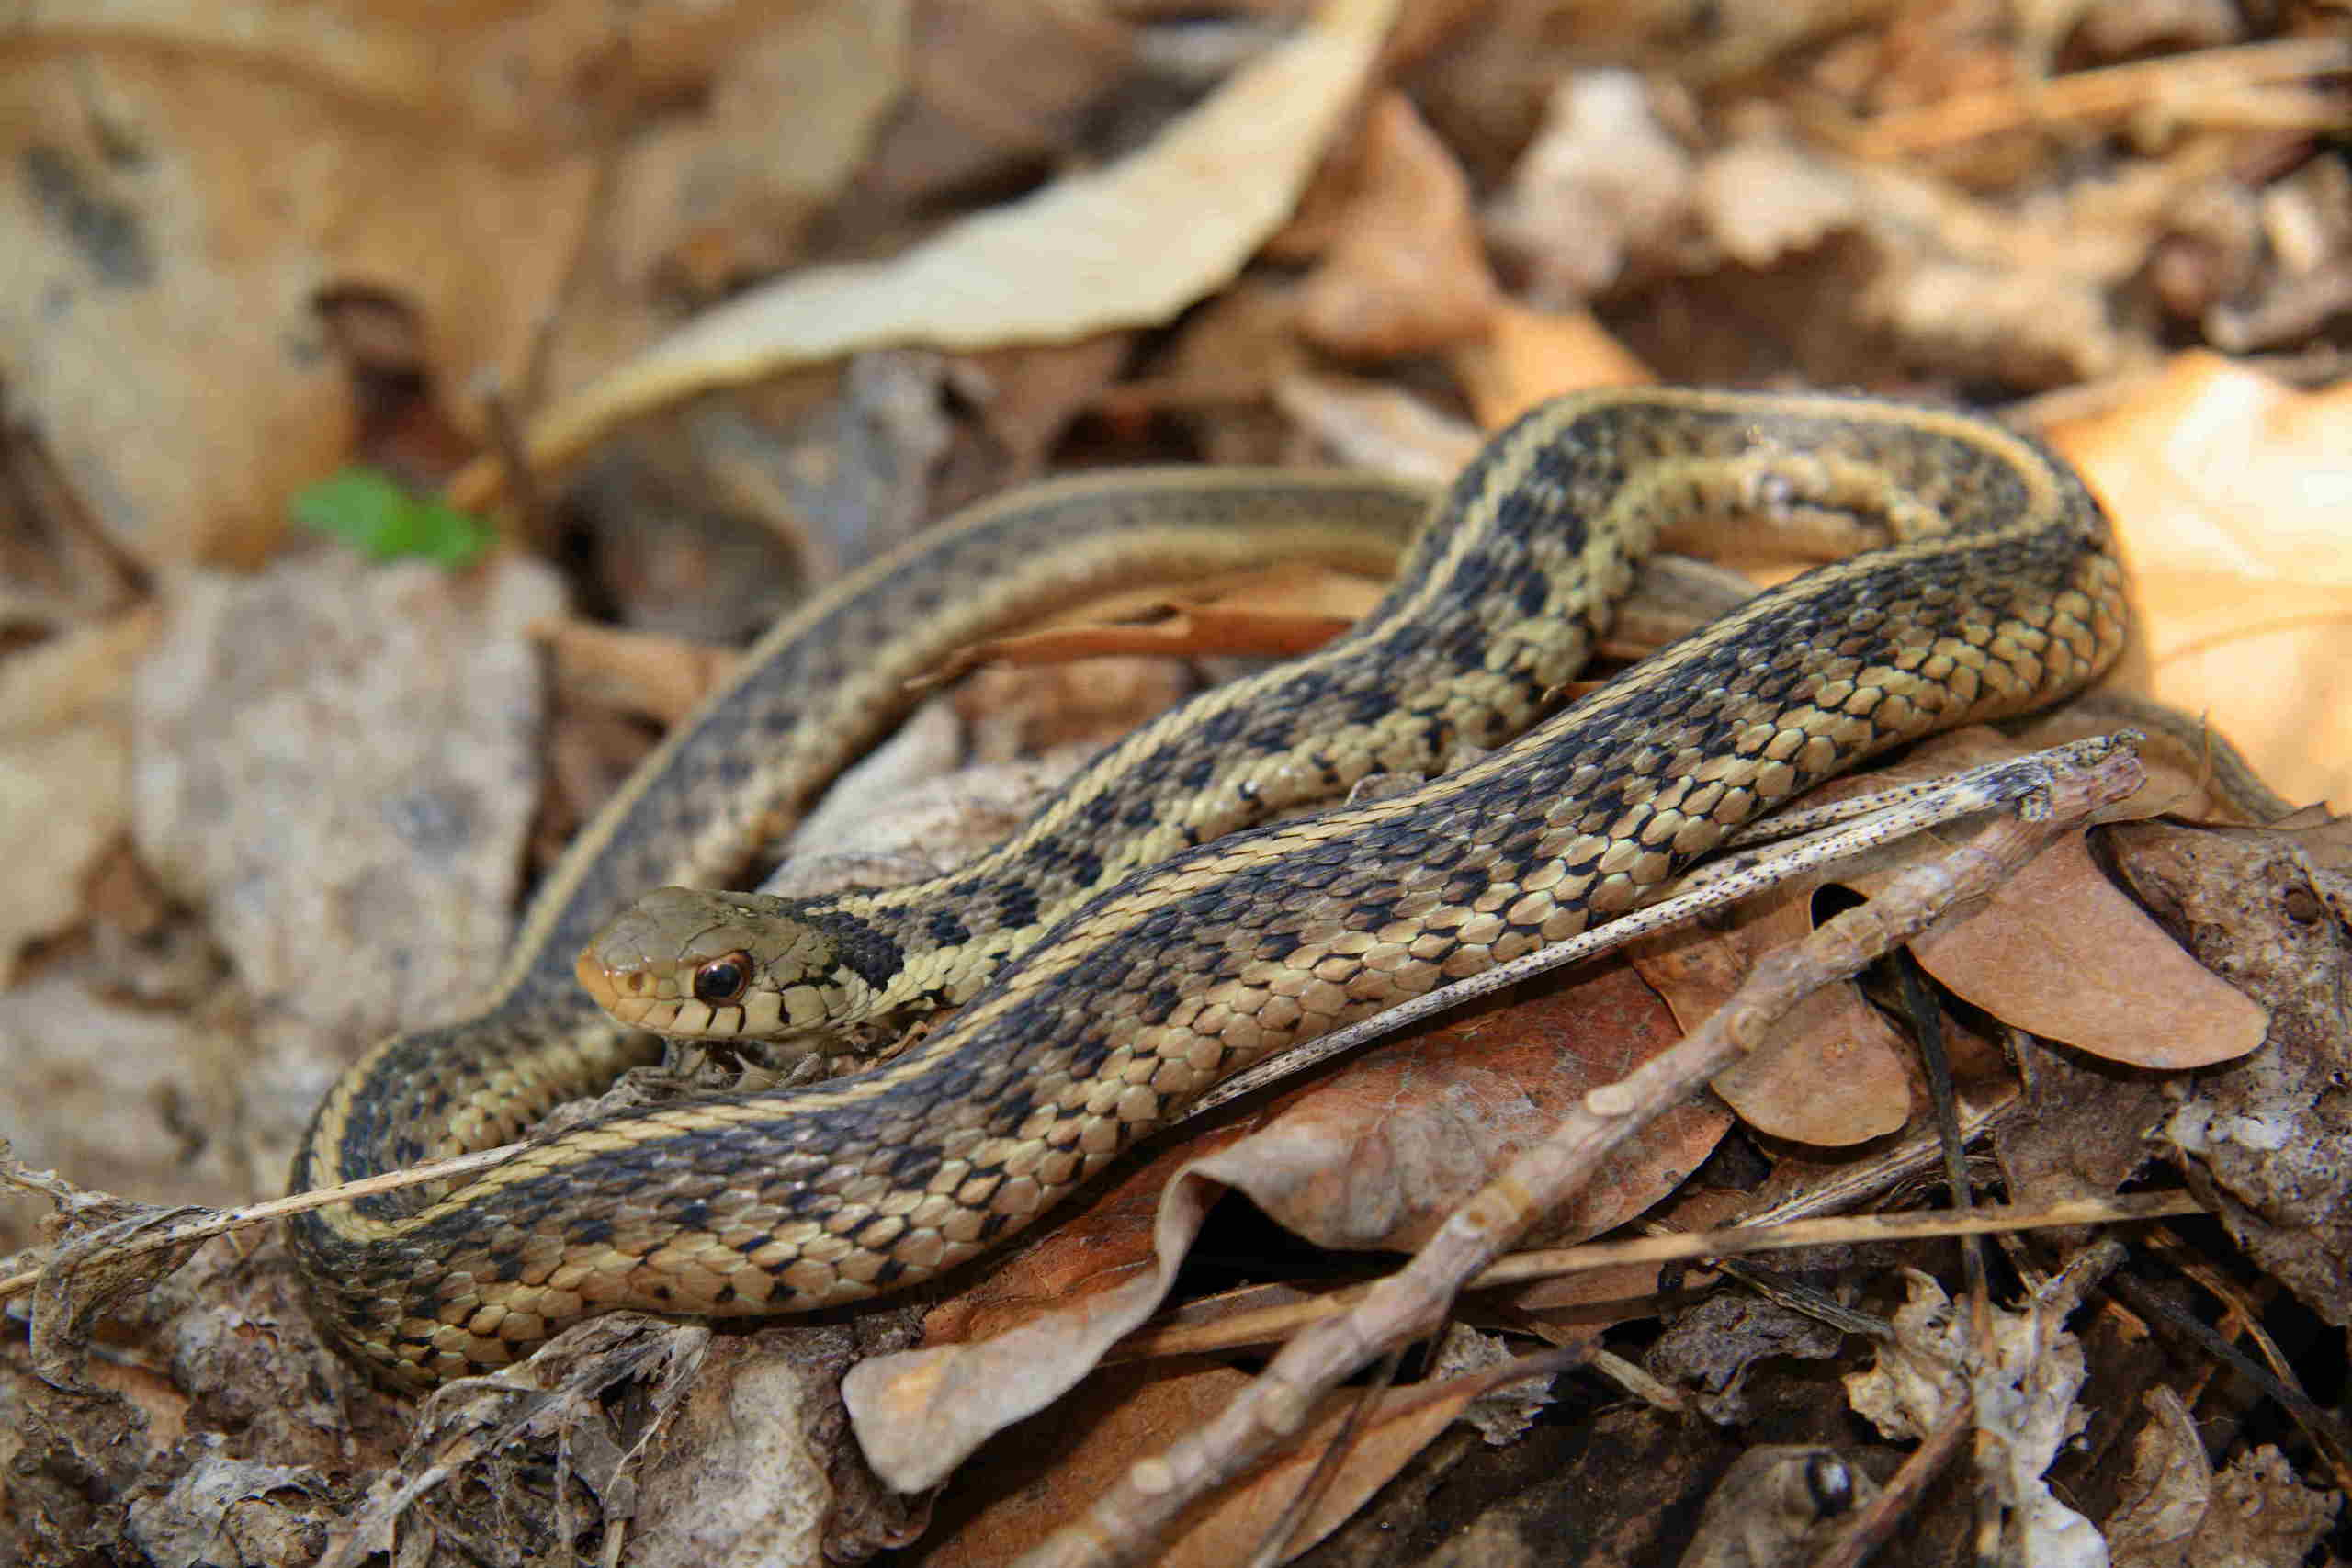 Garter Snake Snakes Photo 2859572 Fanpop